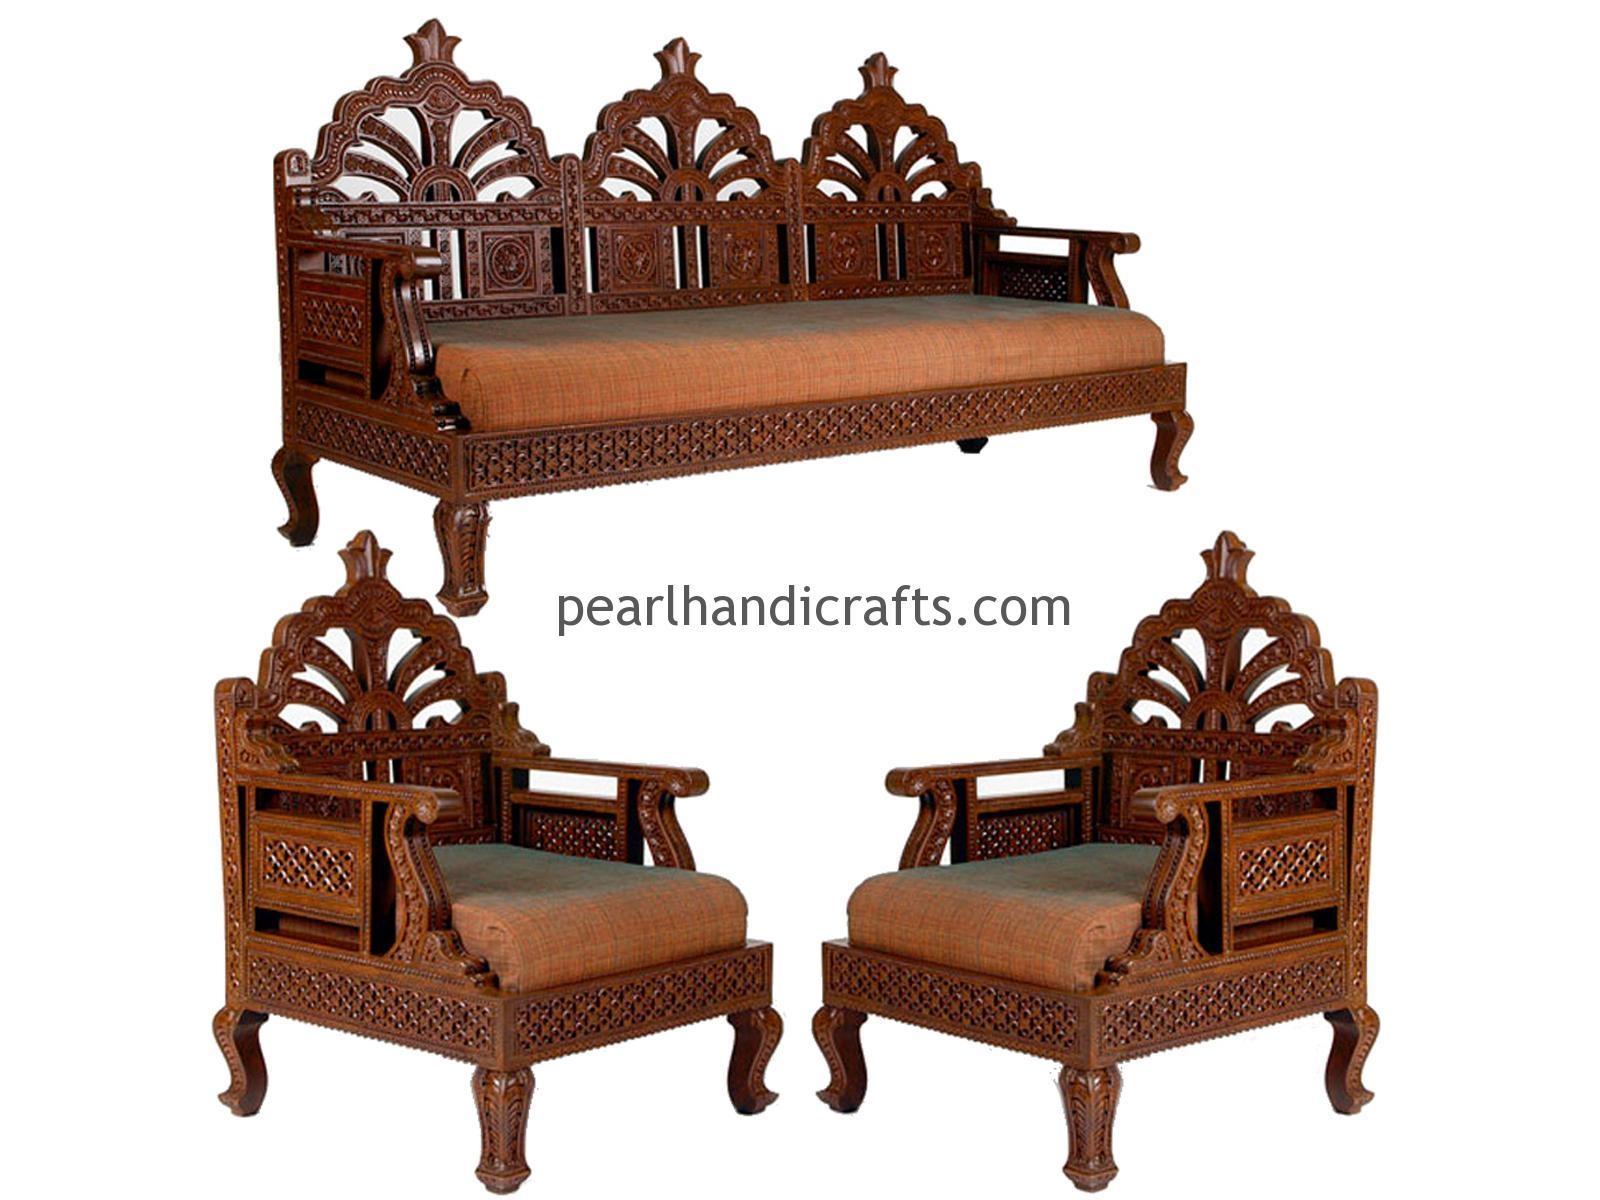 Carving, Circular, Rajasthani,traditional Teak Wood Sofa Set Pertaining To Carved Wood Sofas (Image 6 of 20)